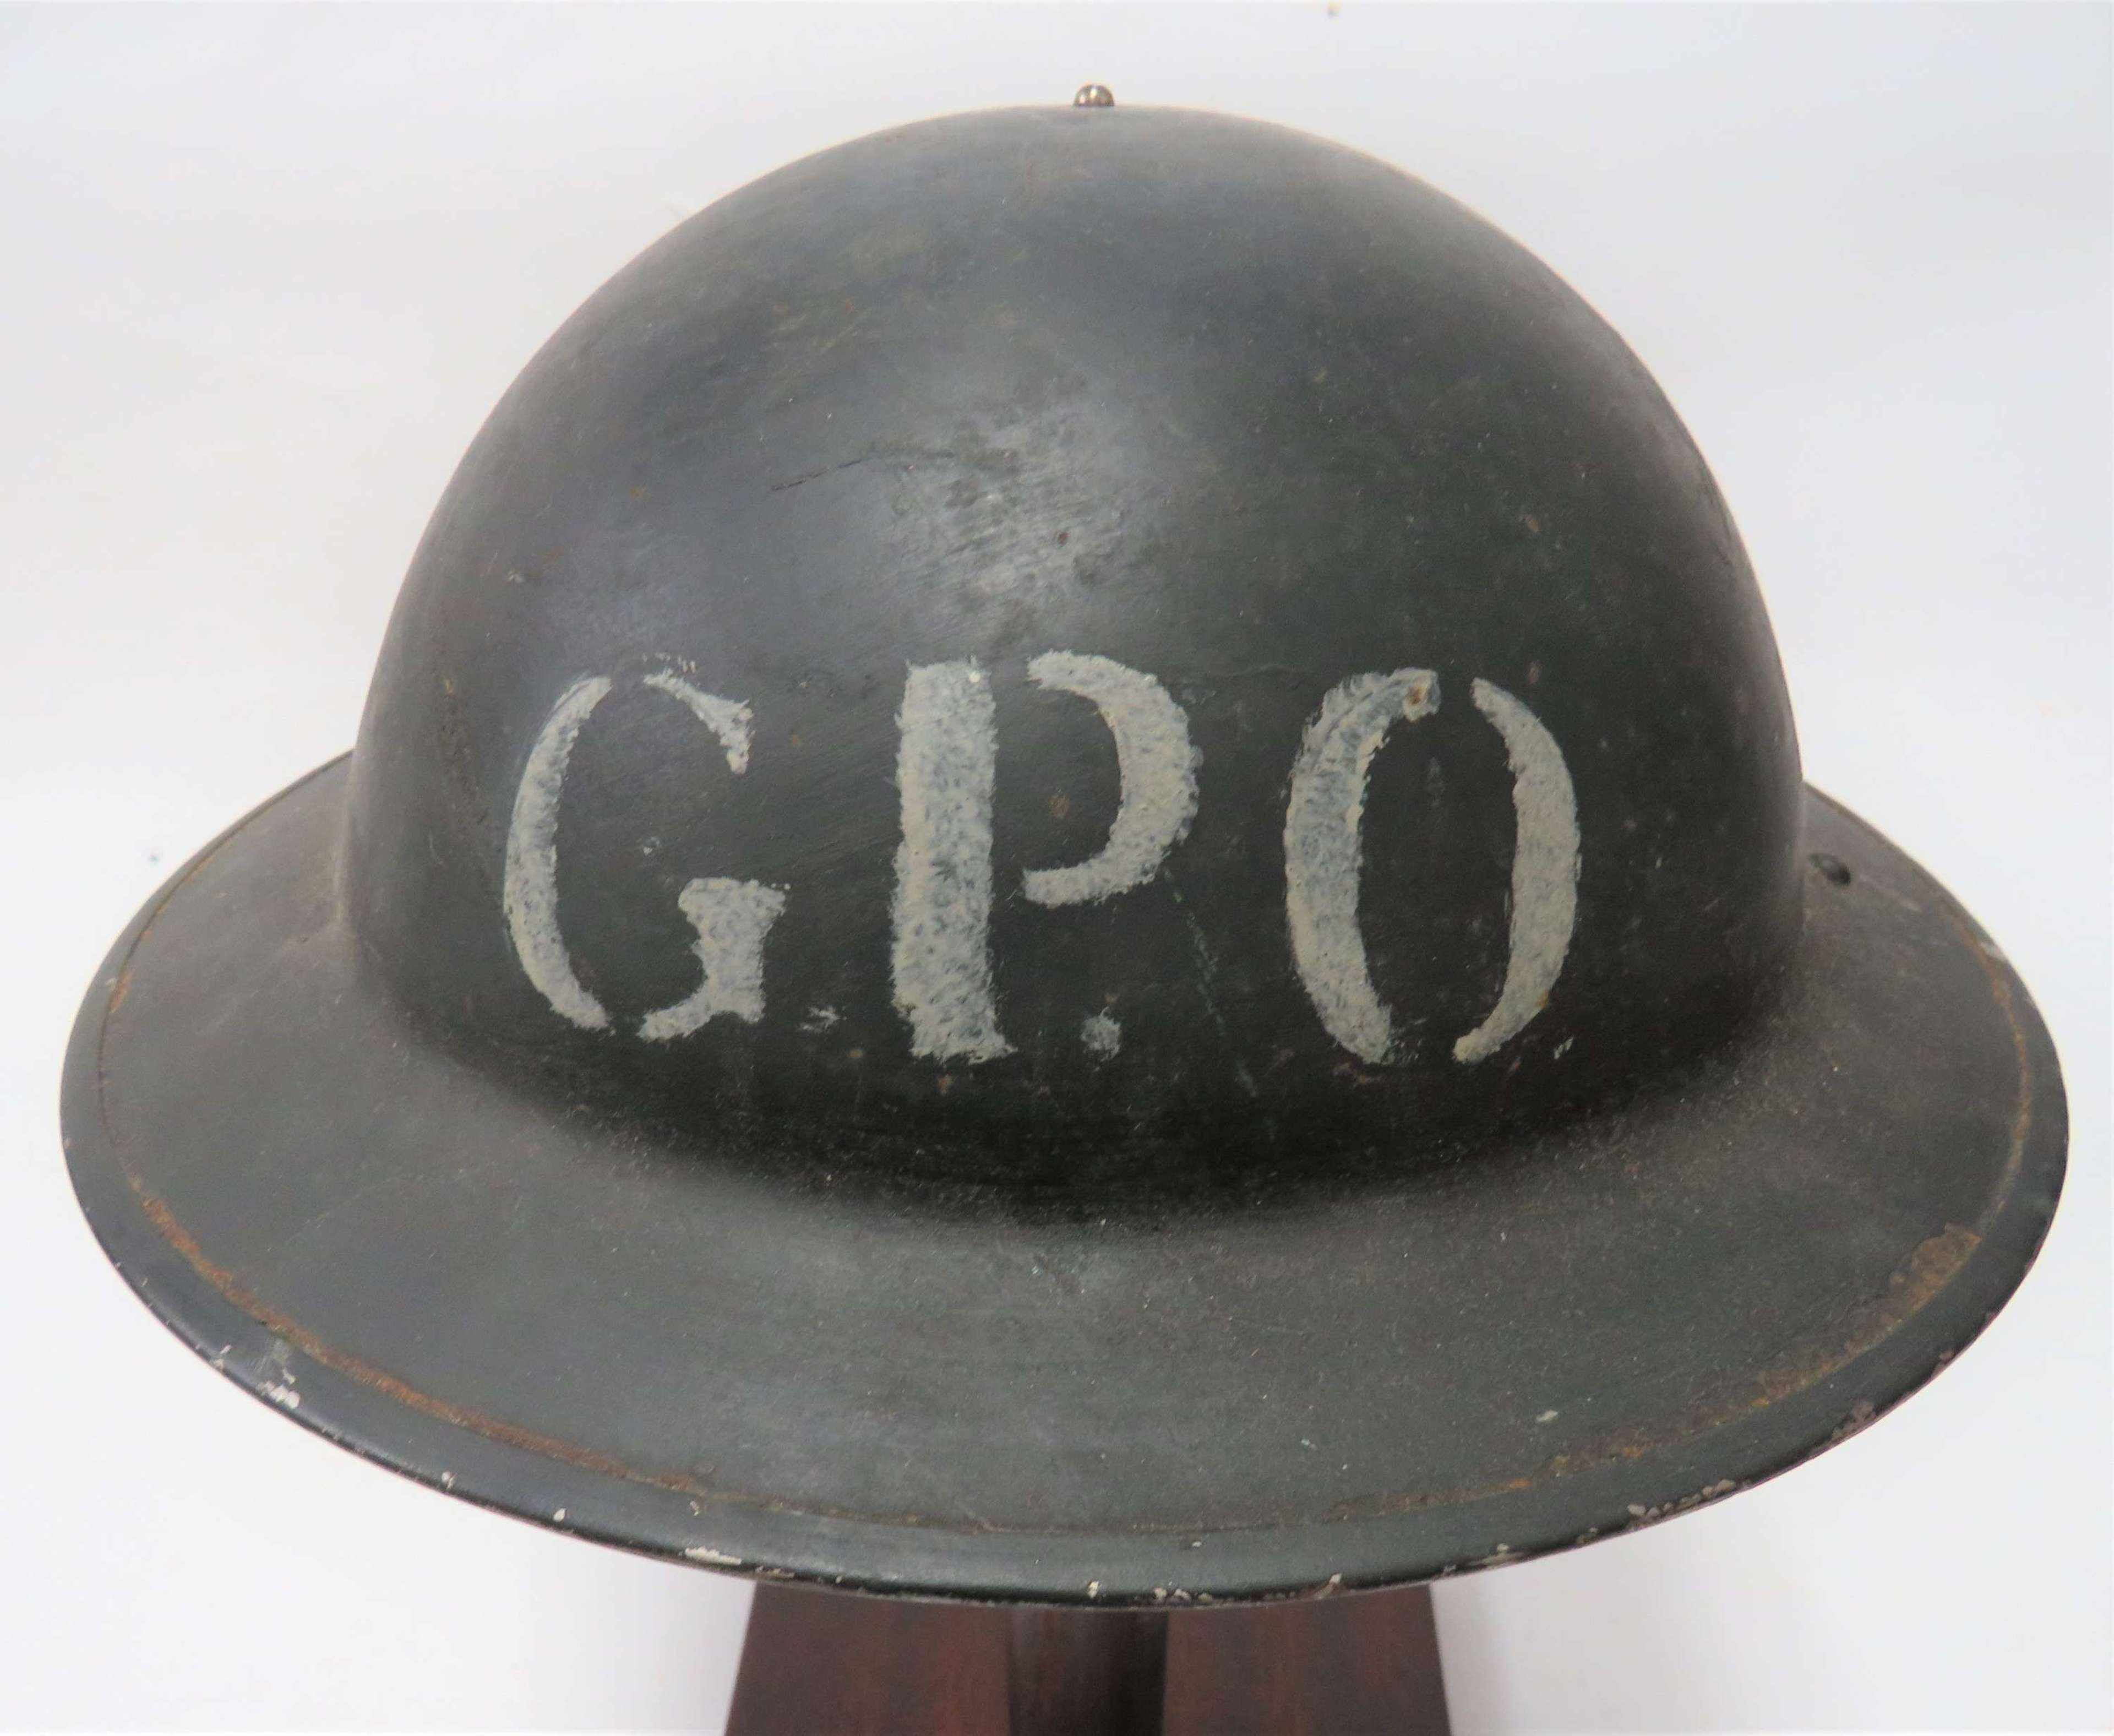 Scarce WW2 G.P.O 1940 Dated Steel Helmet